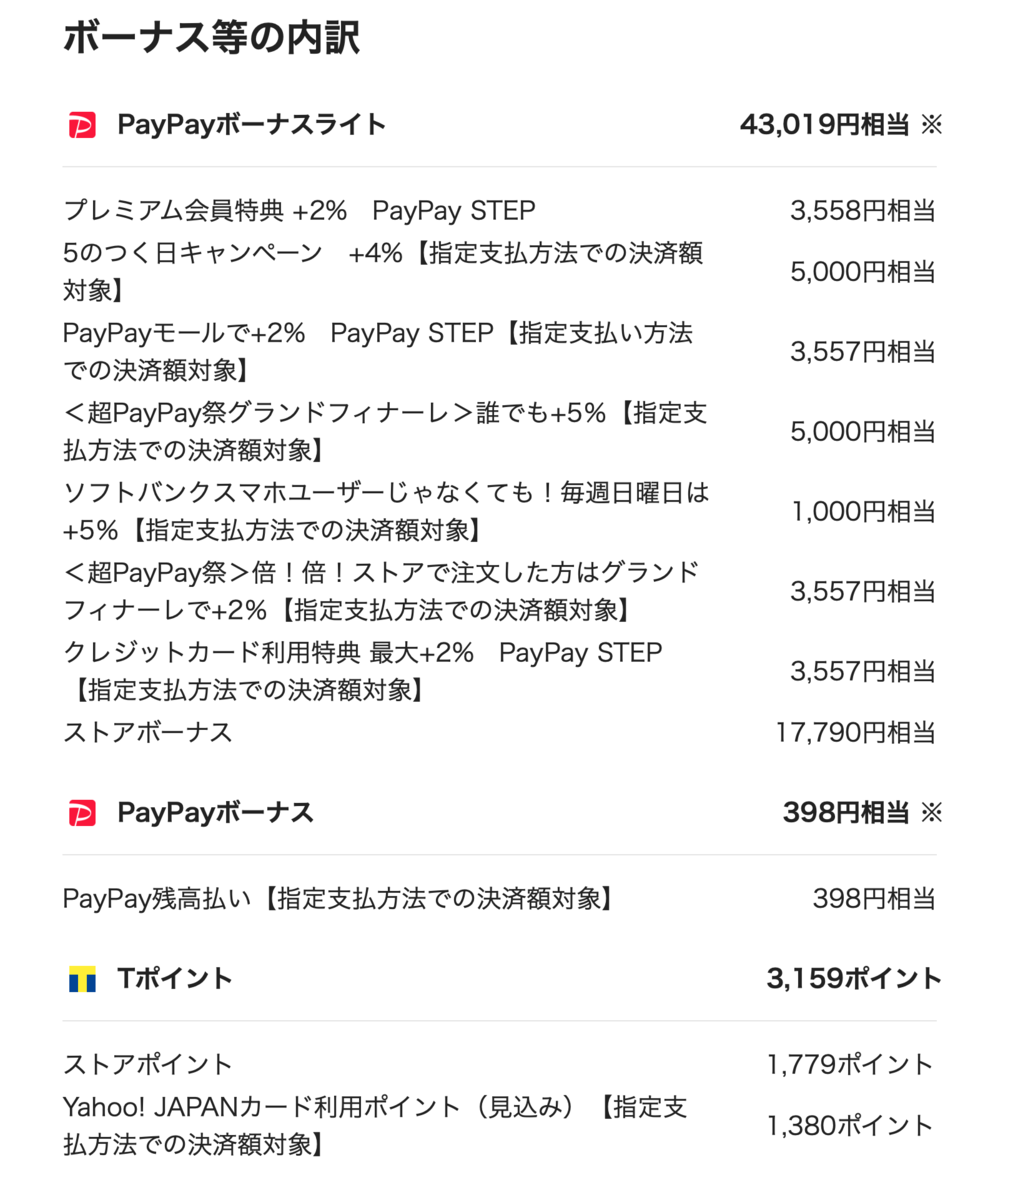 f:id:hayato160:20201116051740p:plain